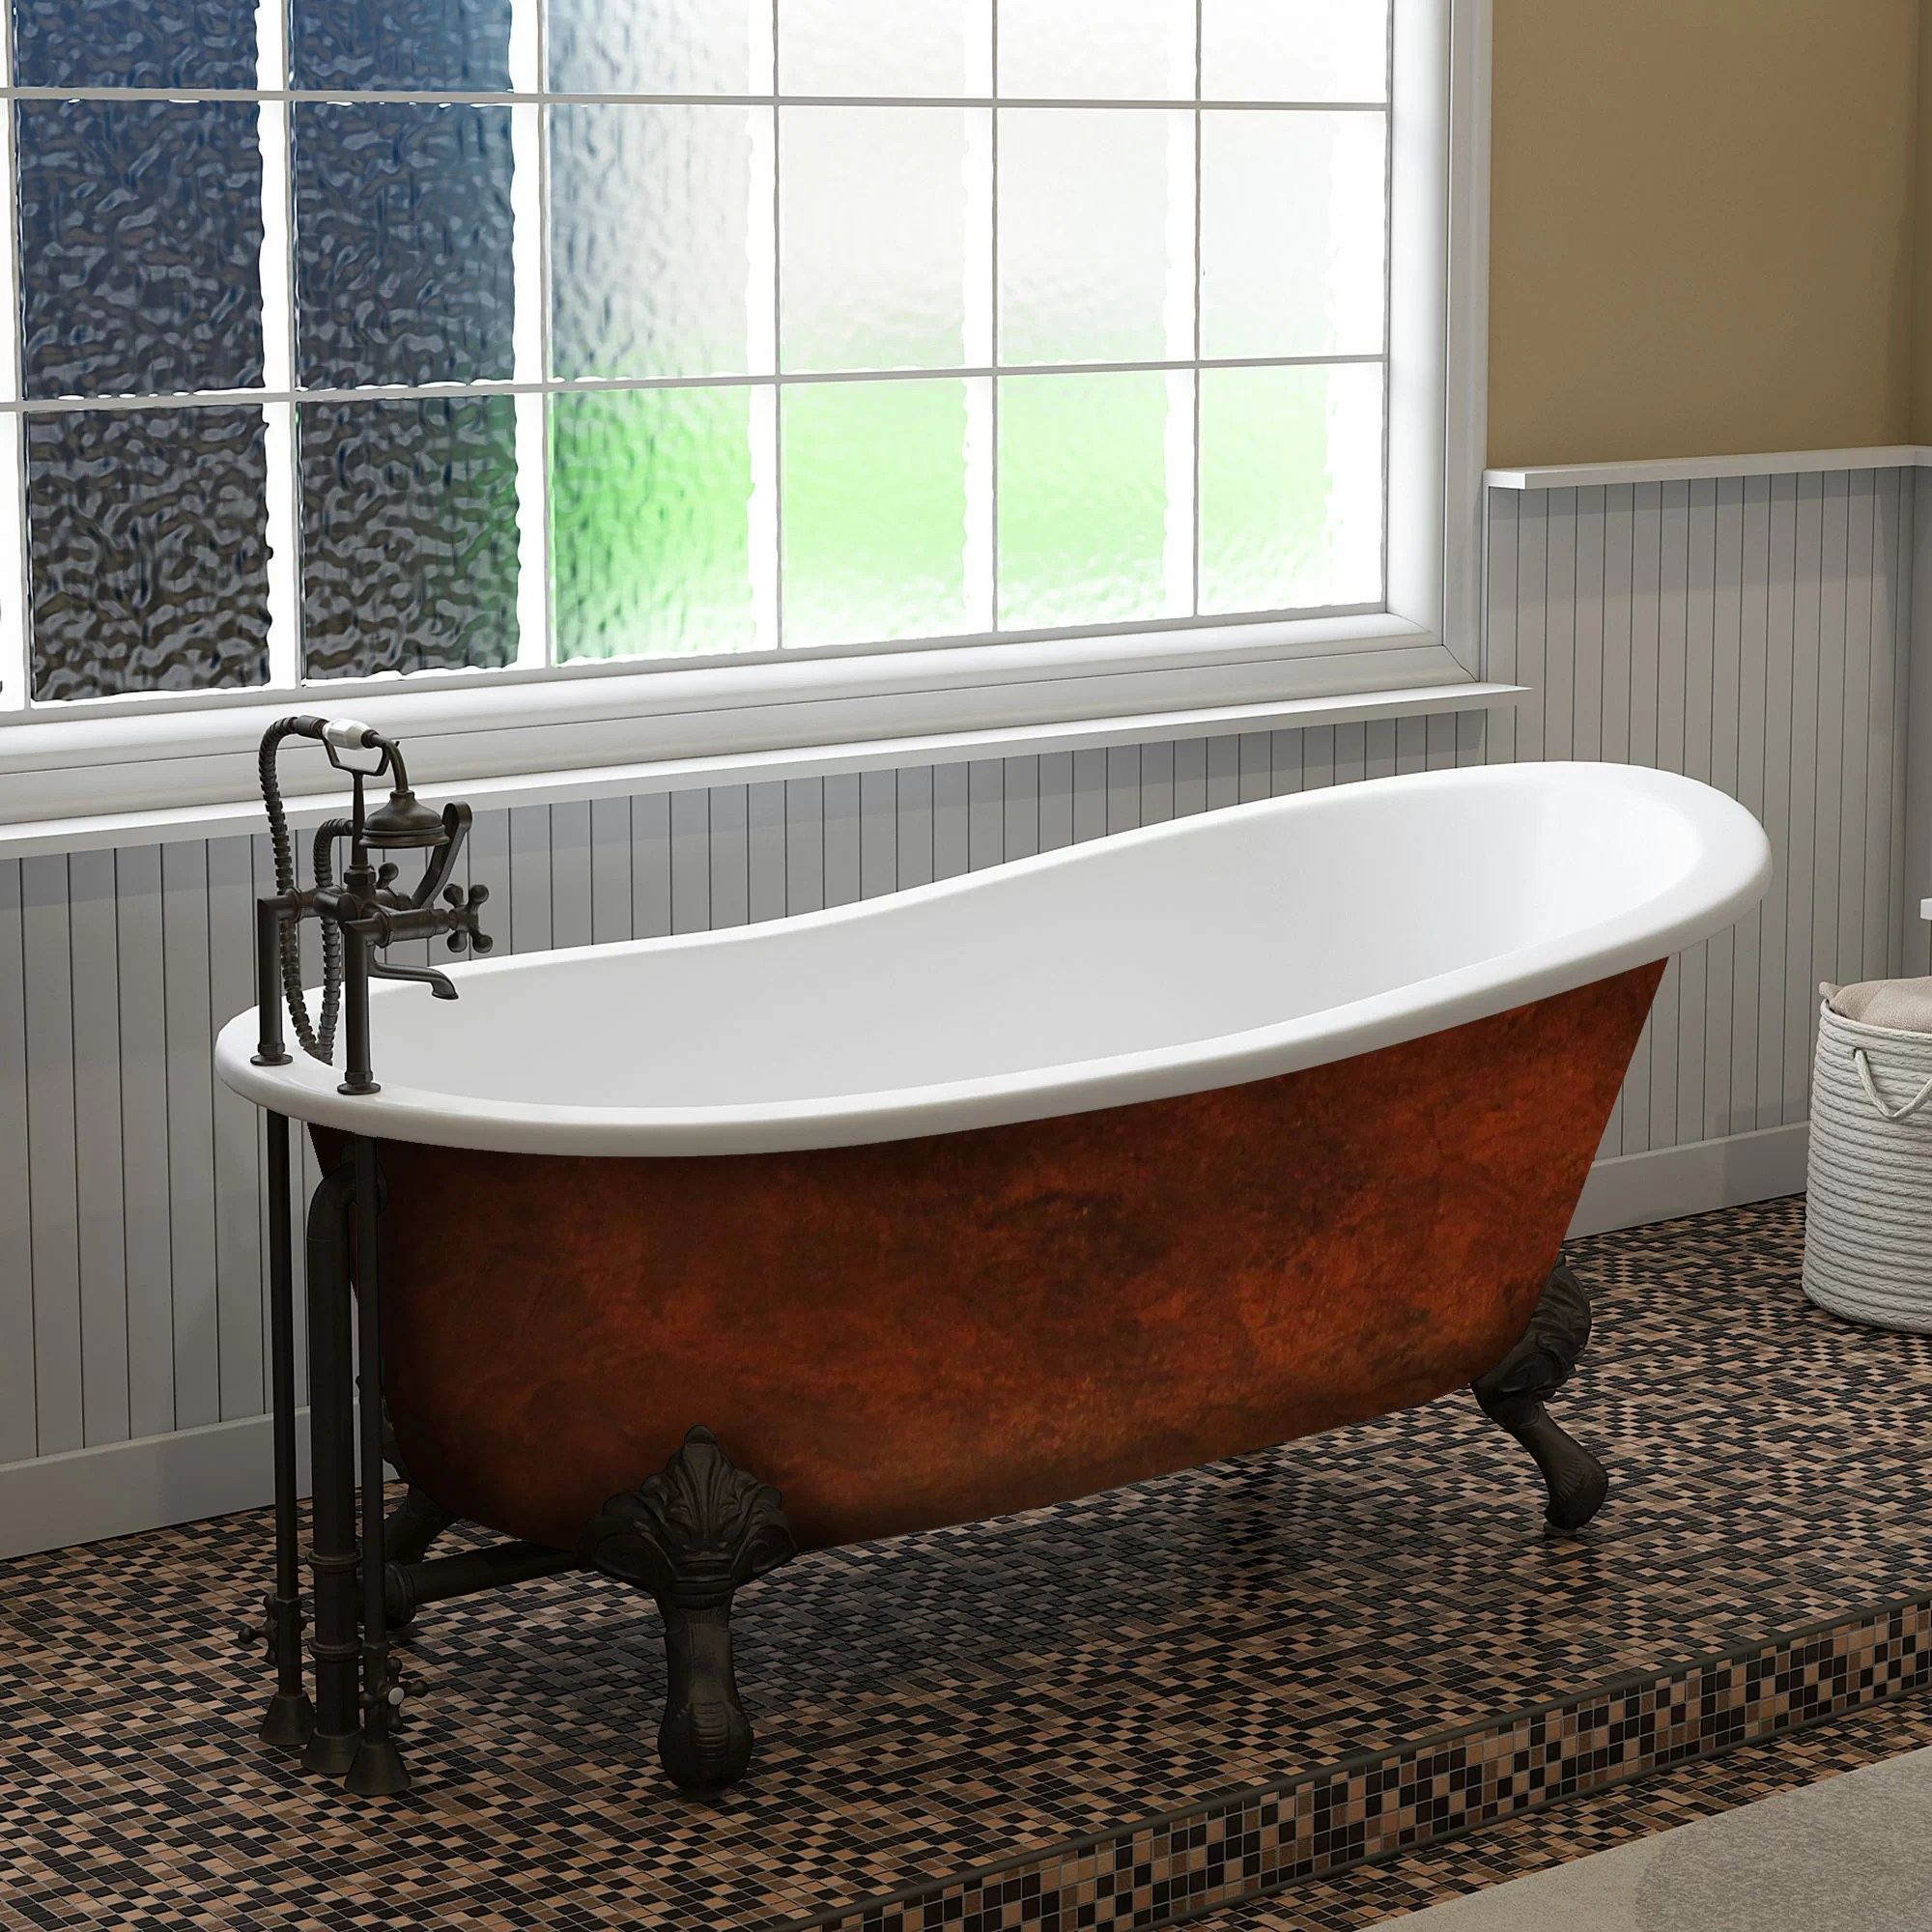 baignoire autoportante en fonte patte de 67 po x 30 po